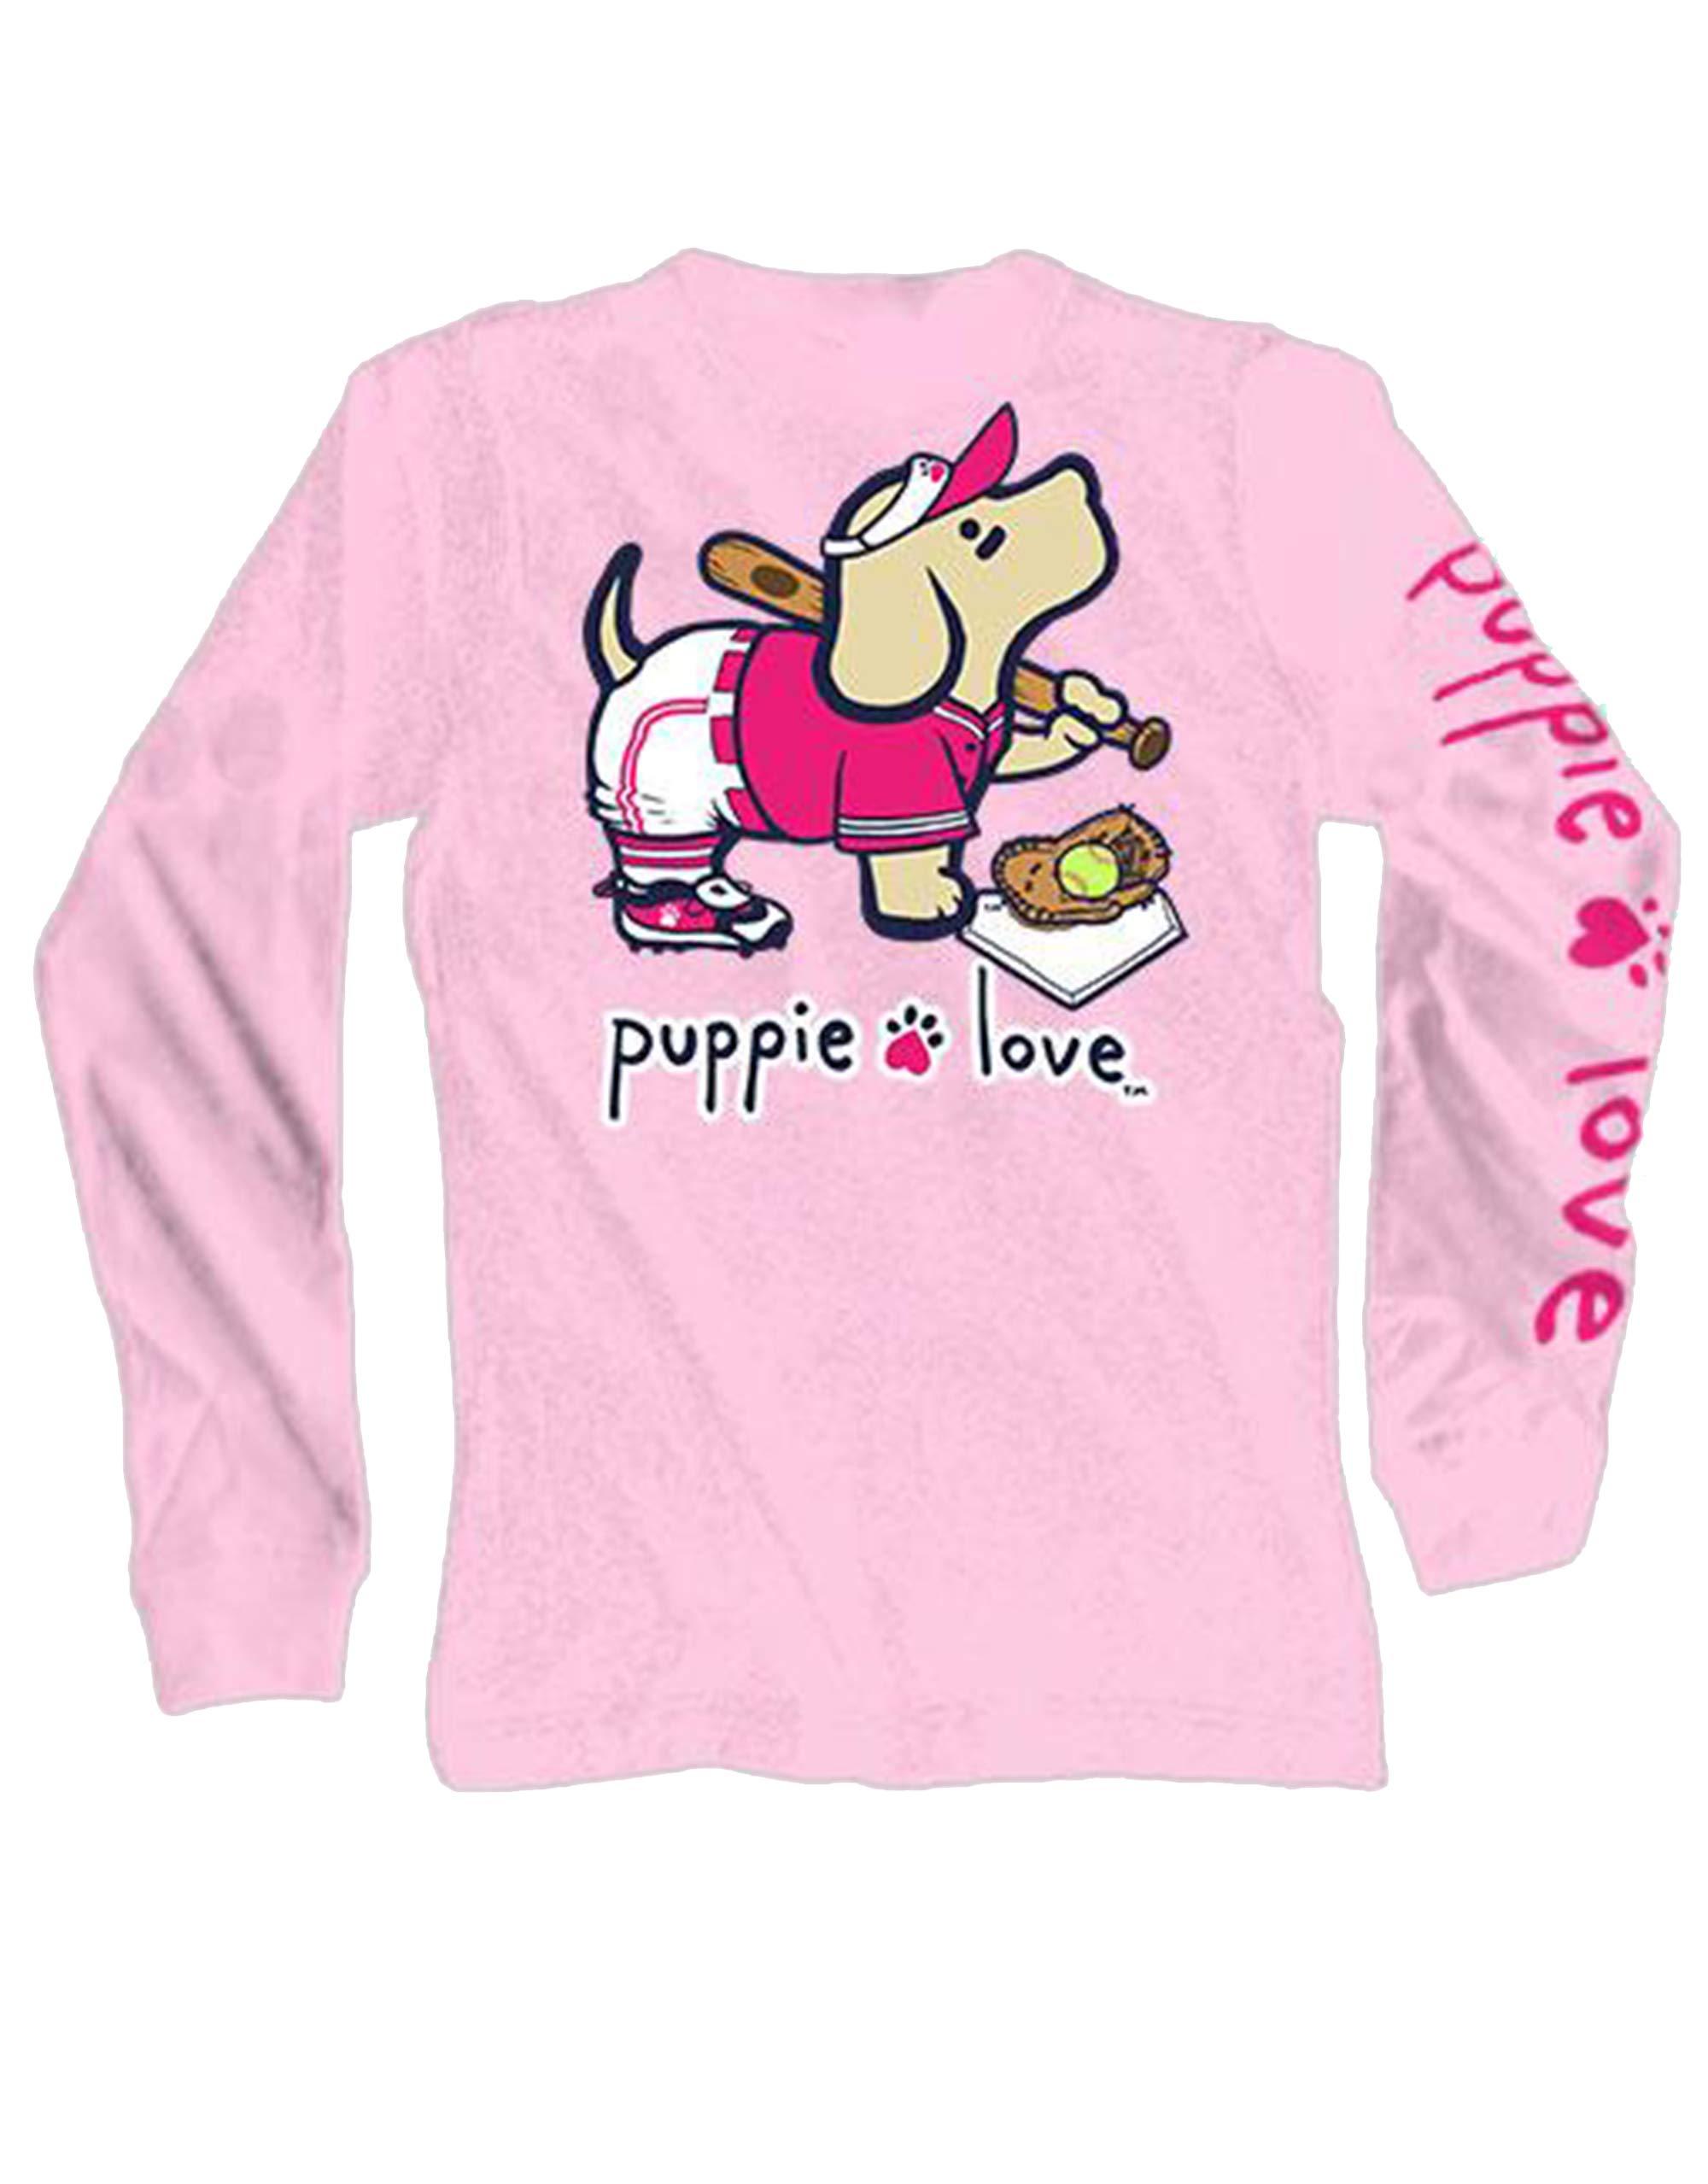 Puppie Love Softball Pup Adult Long Sleeve T-Shirt-Small